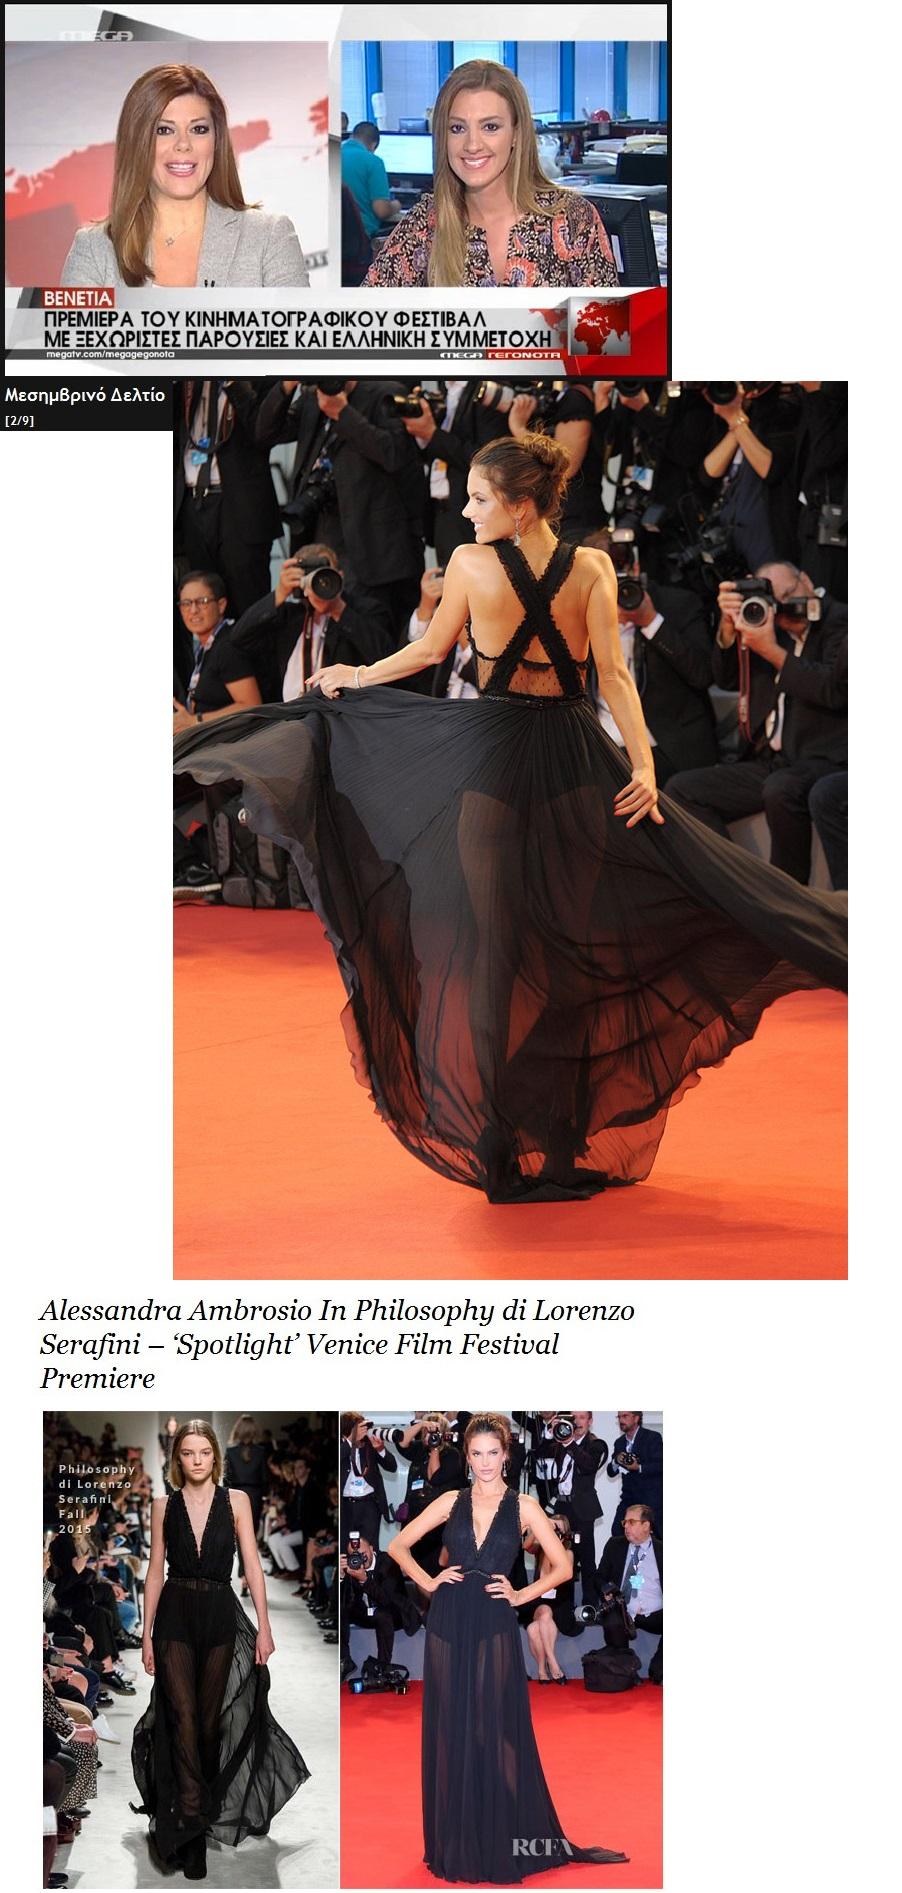 ITALY VENICE FILM FASTIVAL ALESSANDRA AMBROSIO 01 060915